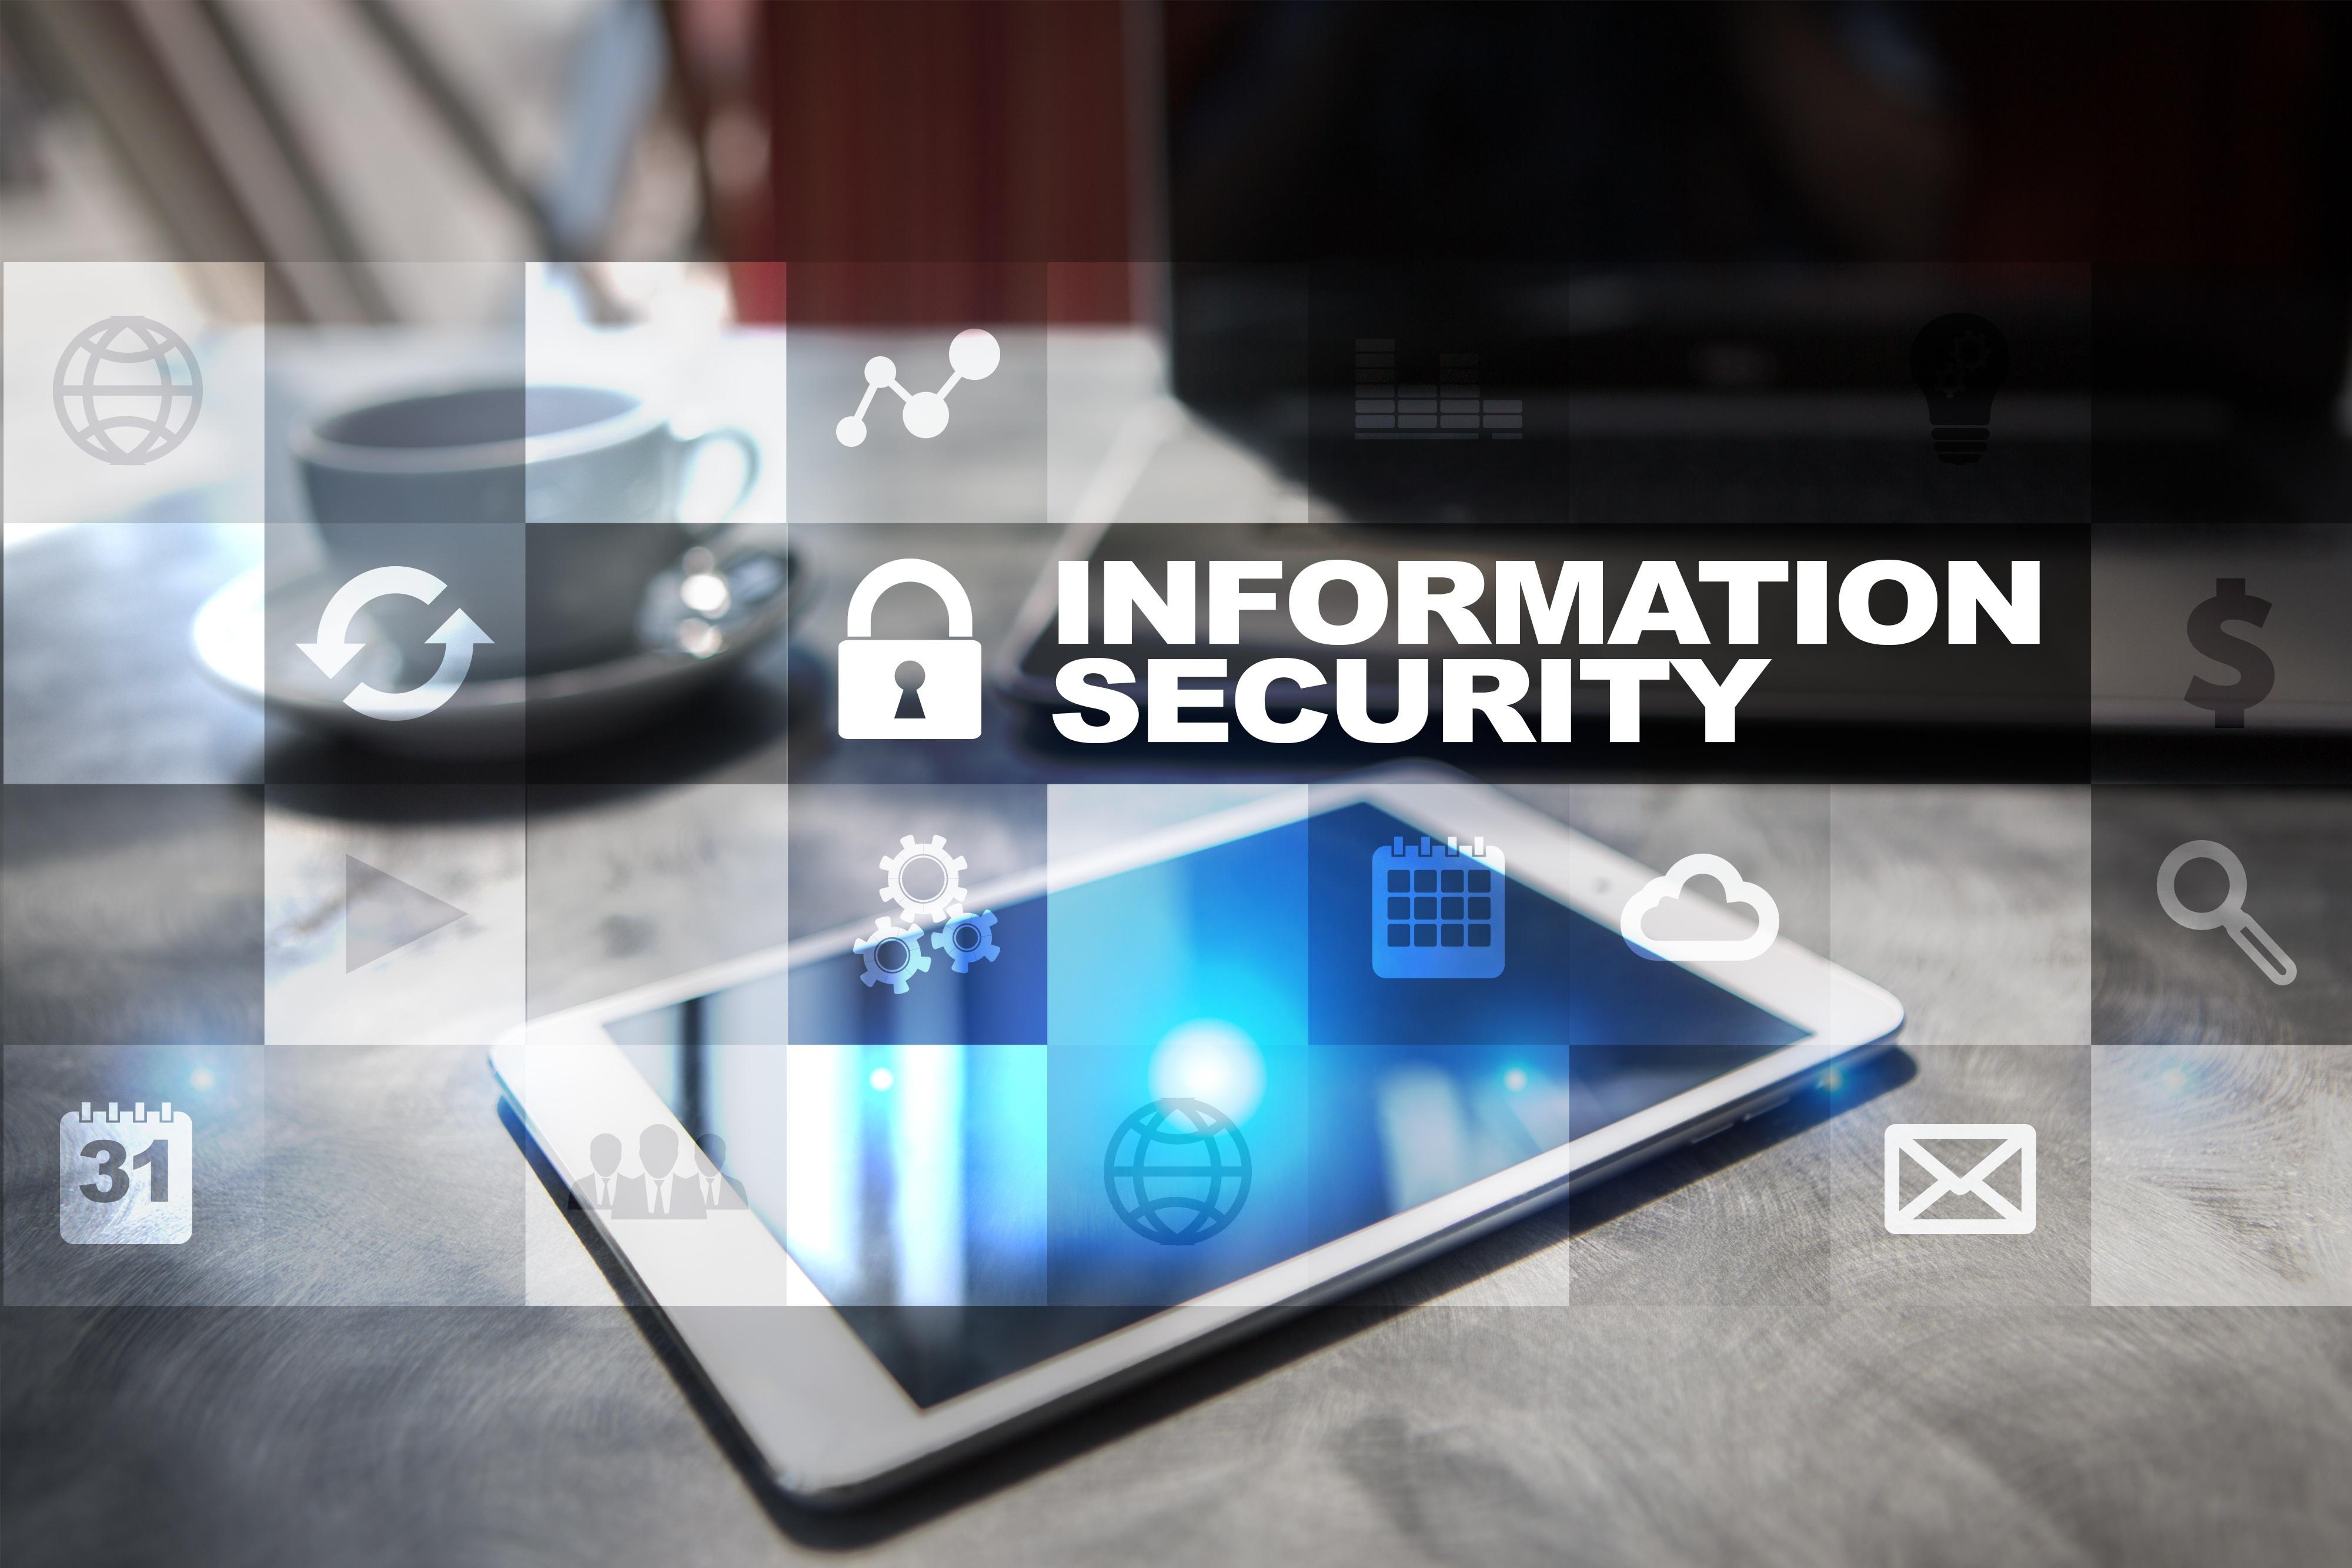 InfoSec Image